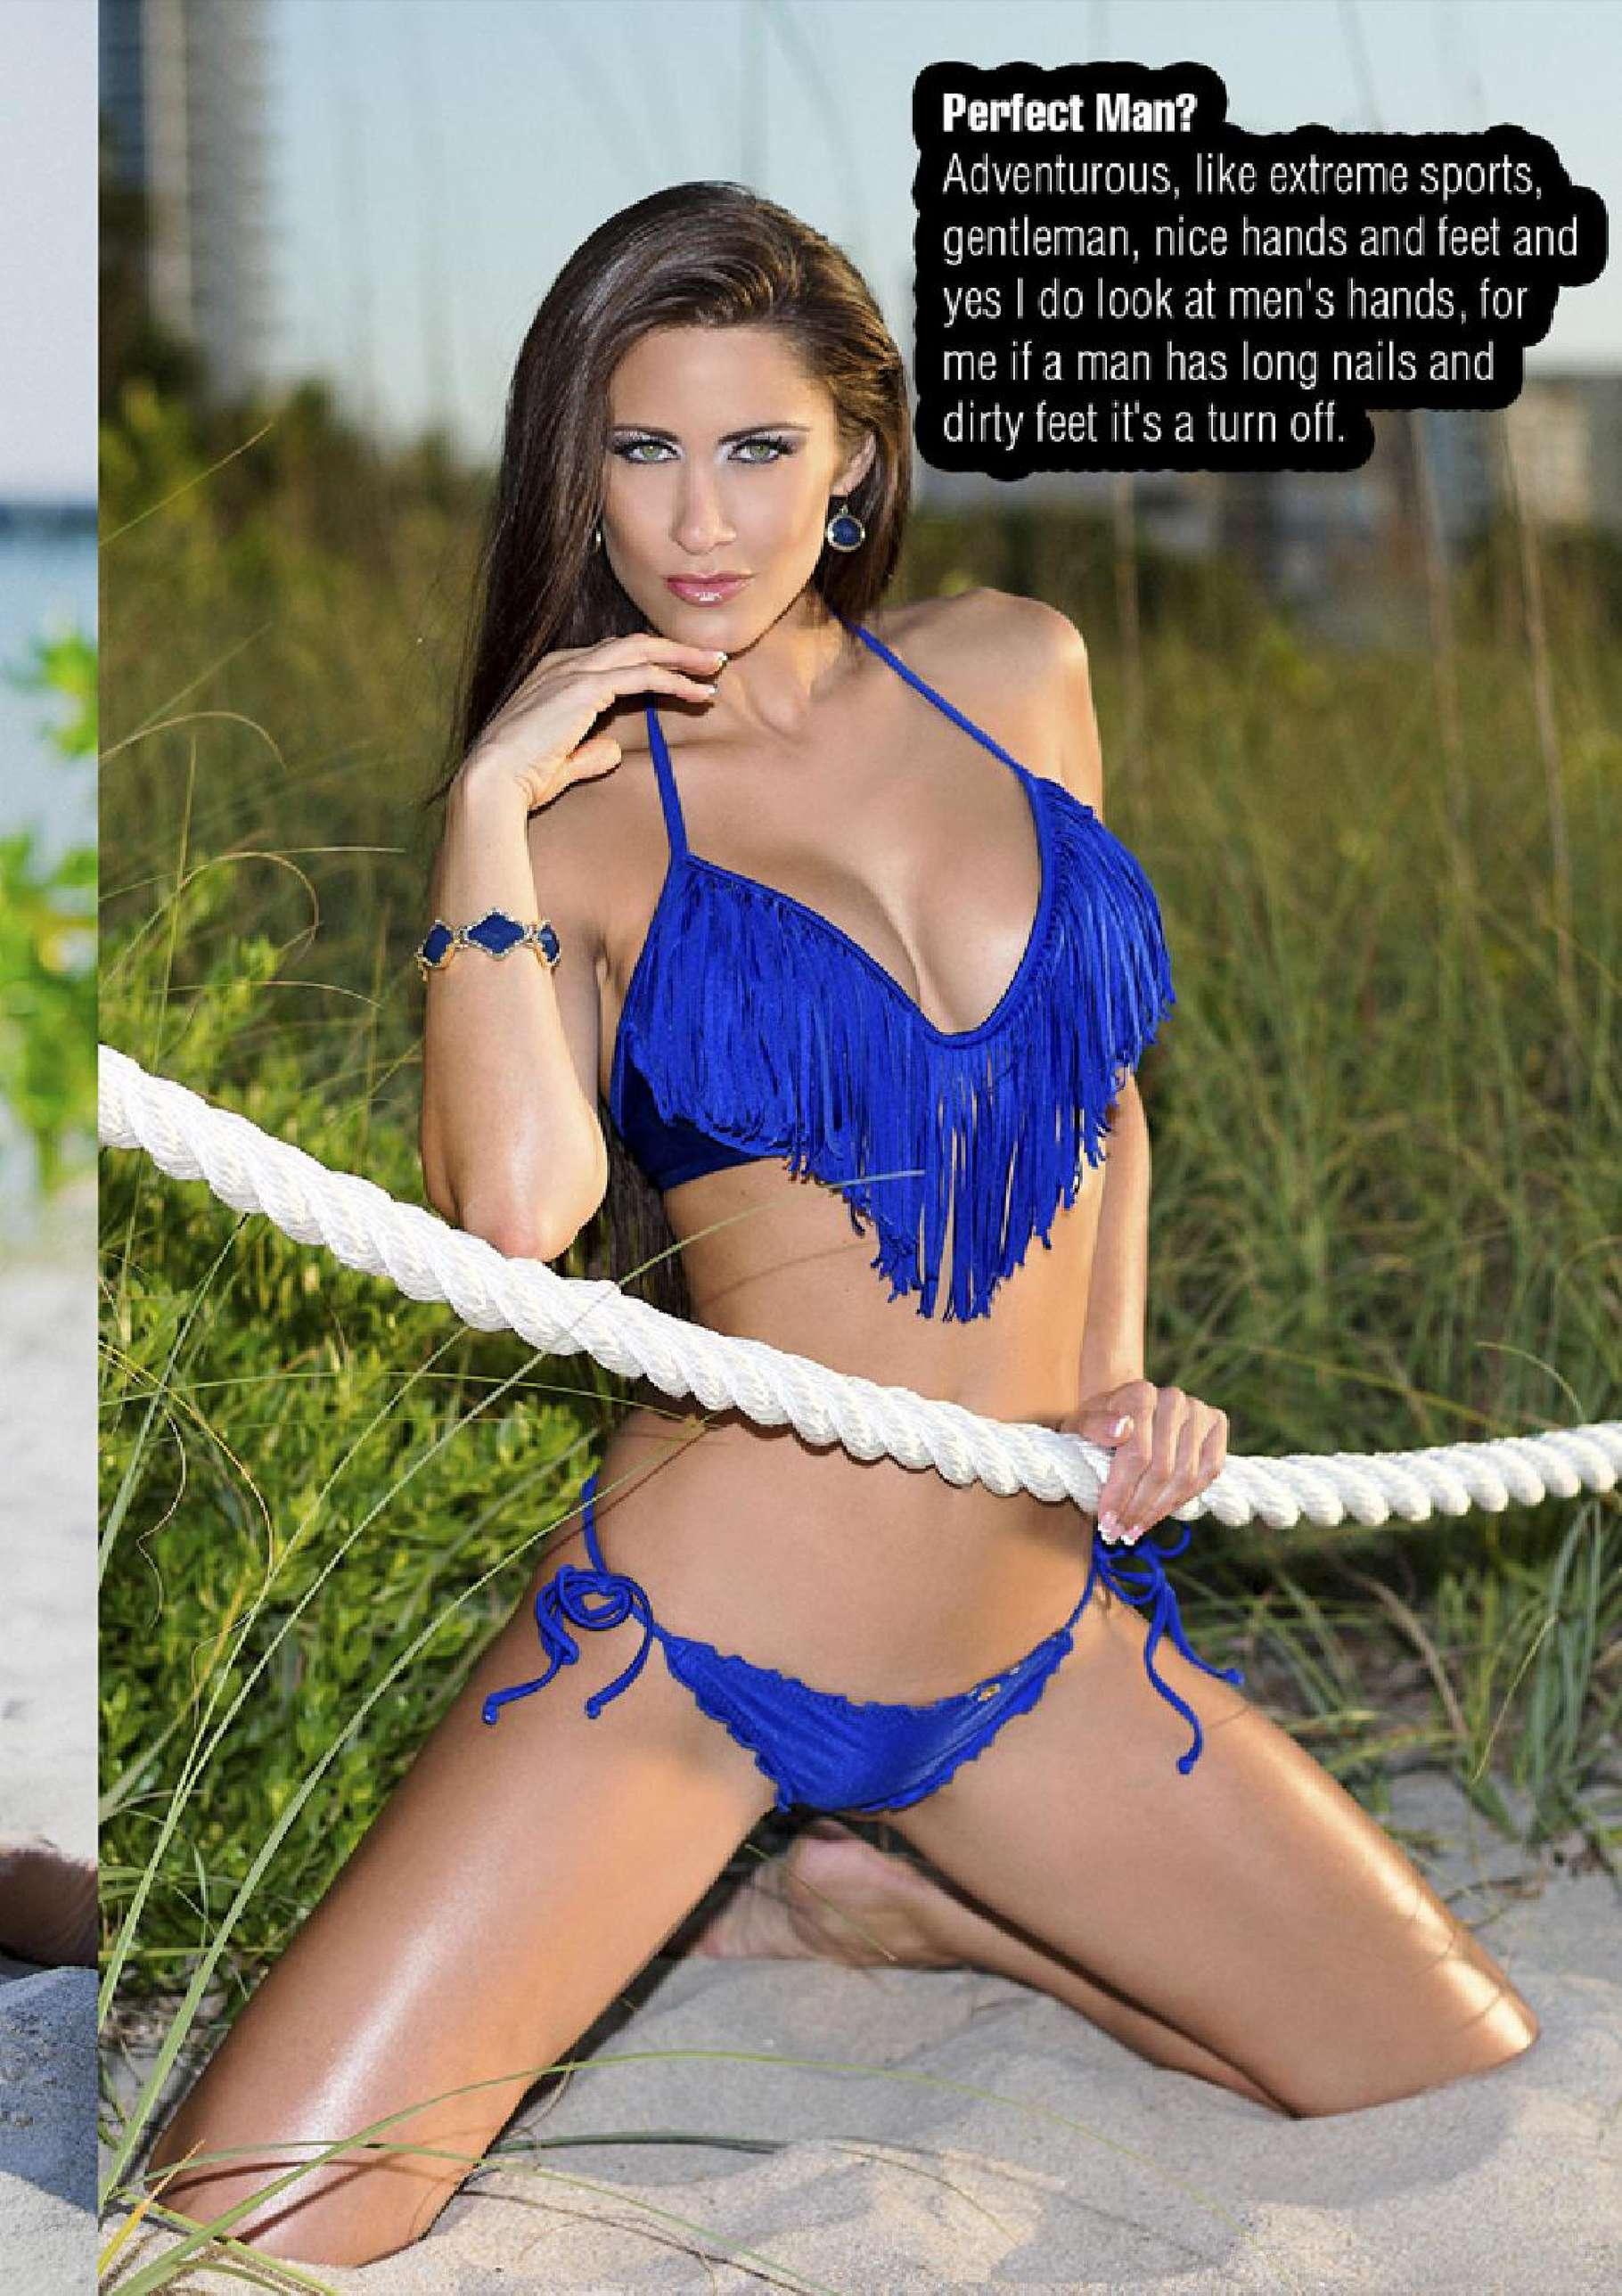 Anais zanotti pictures - Anais Zanotti Fwm Magazine April 2014 02